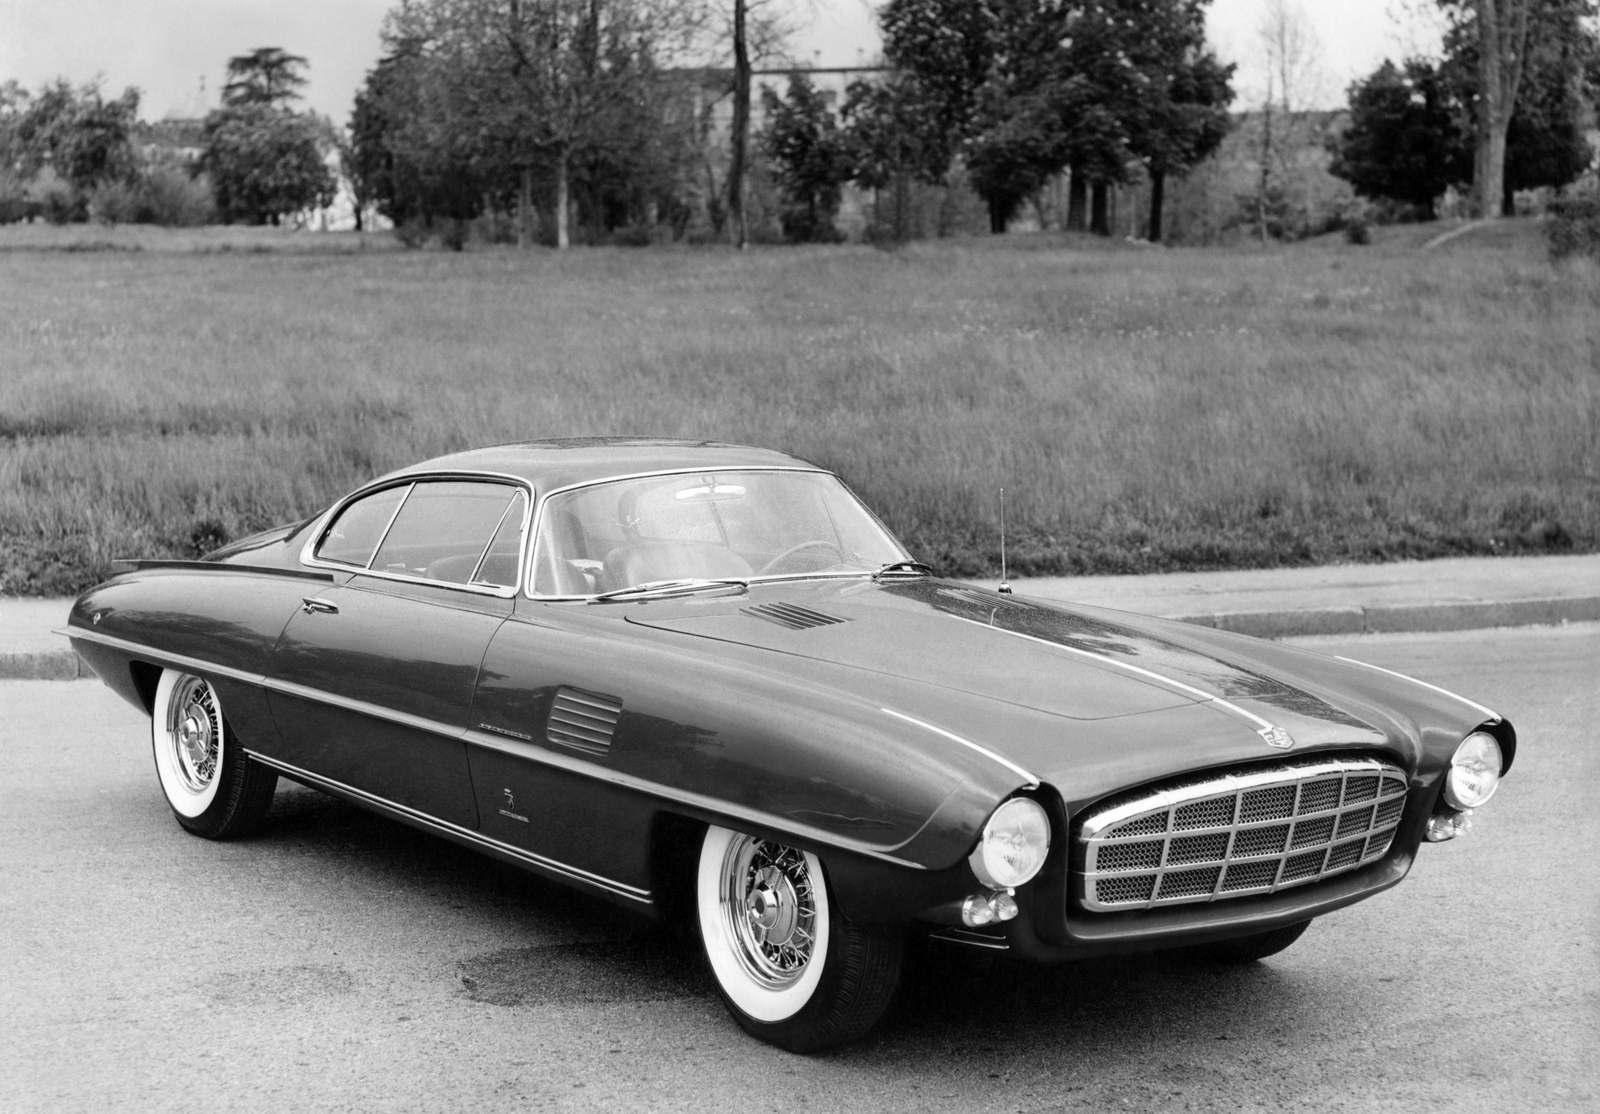 1955. DeSoto Adventurer II Concept (Ghia)